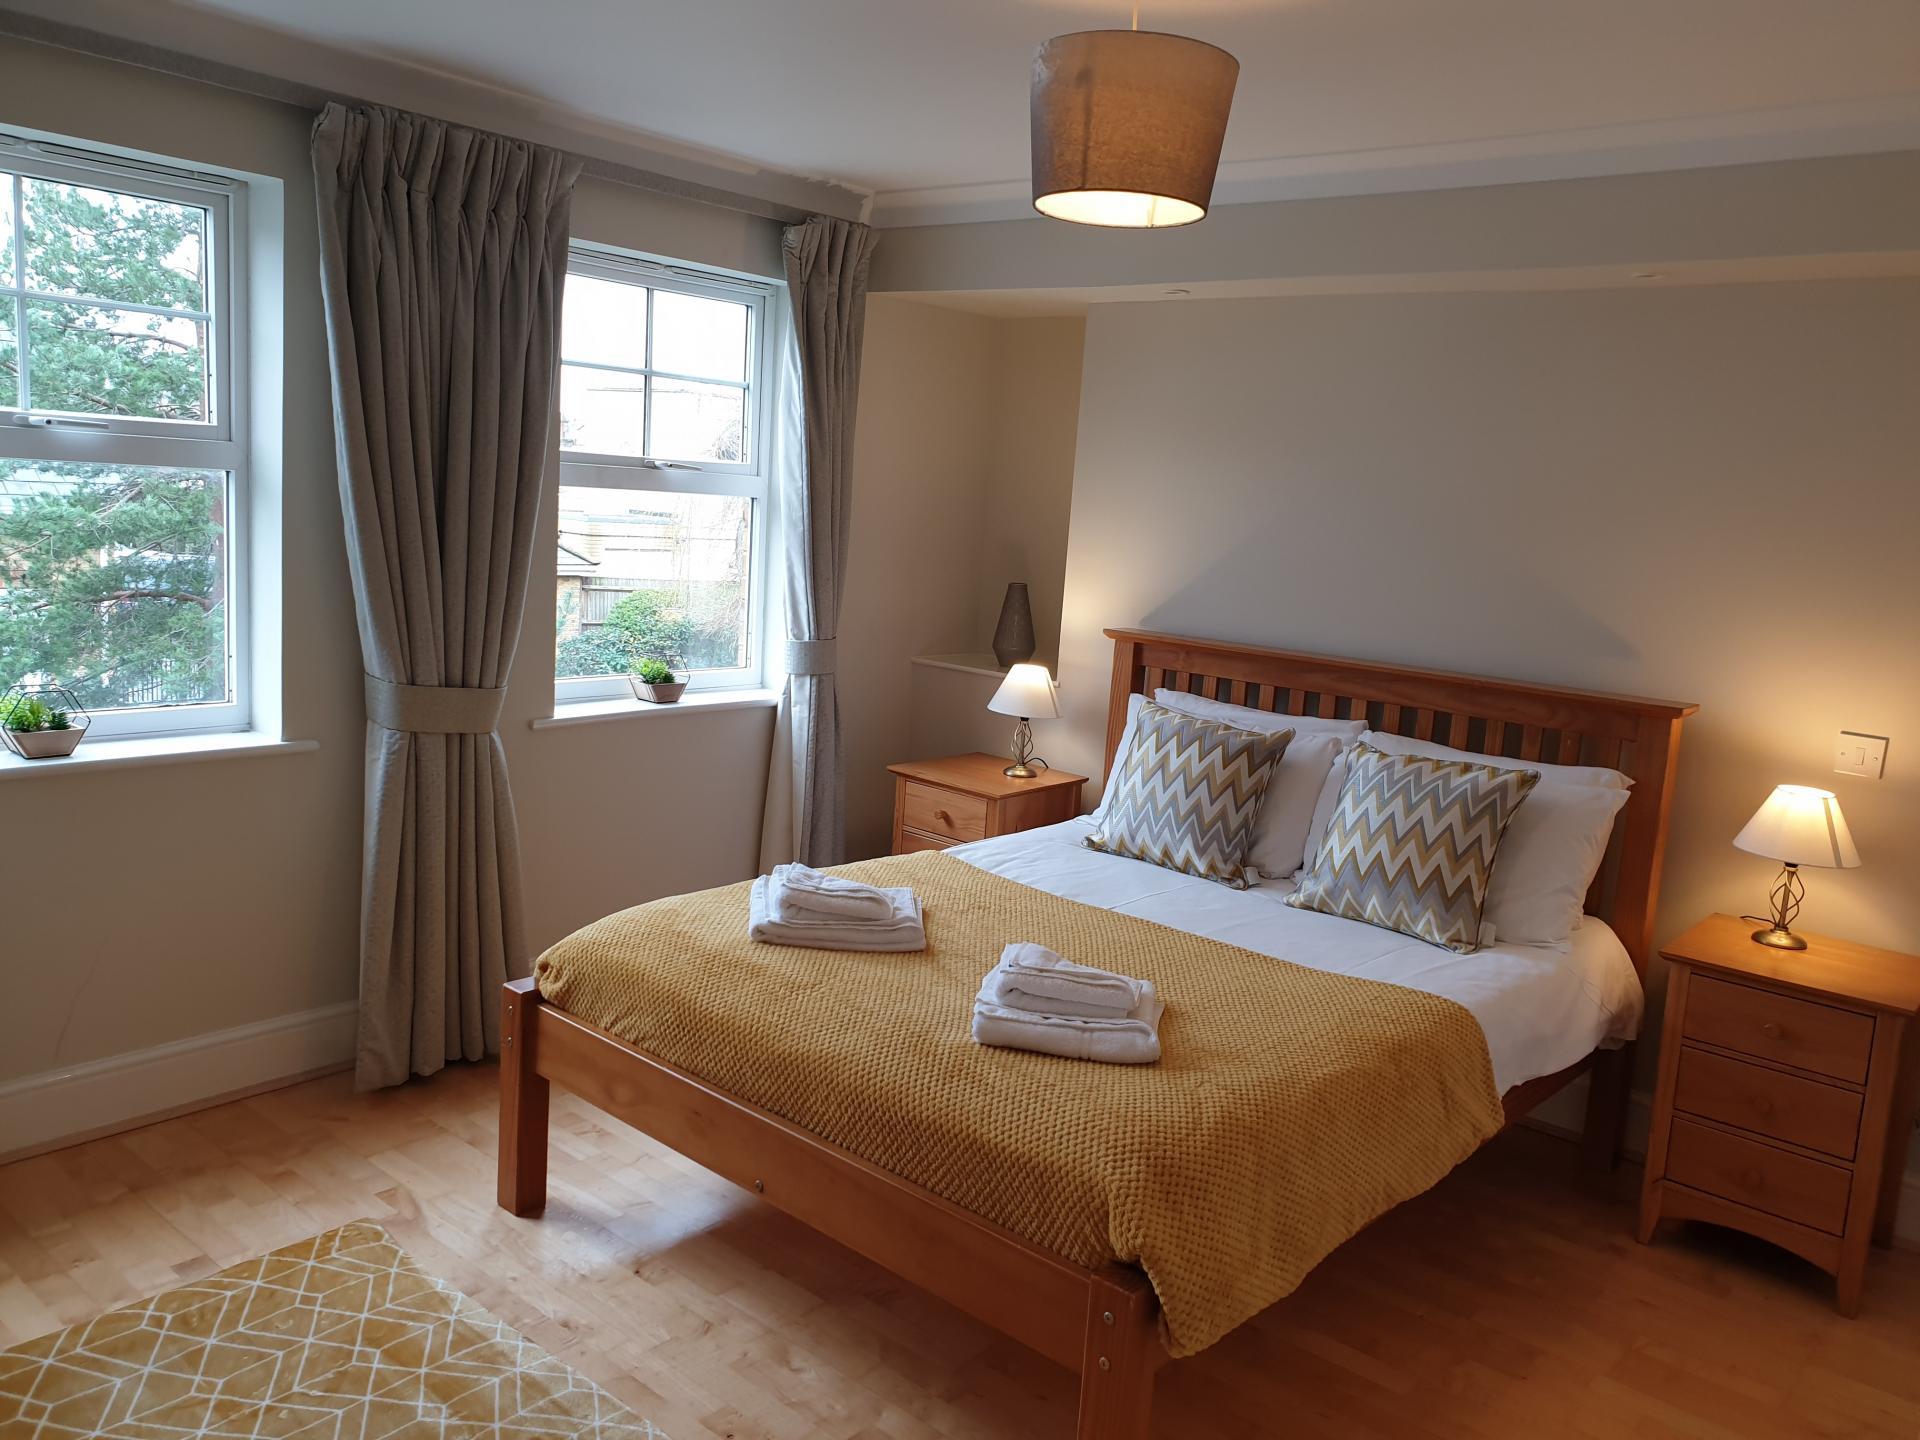 Bed at Alexander La Roche Court Apartments, Richmond, London